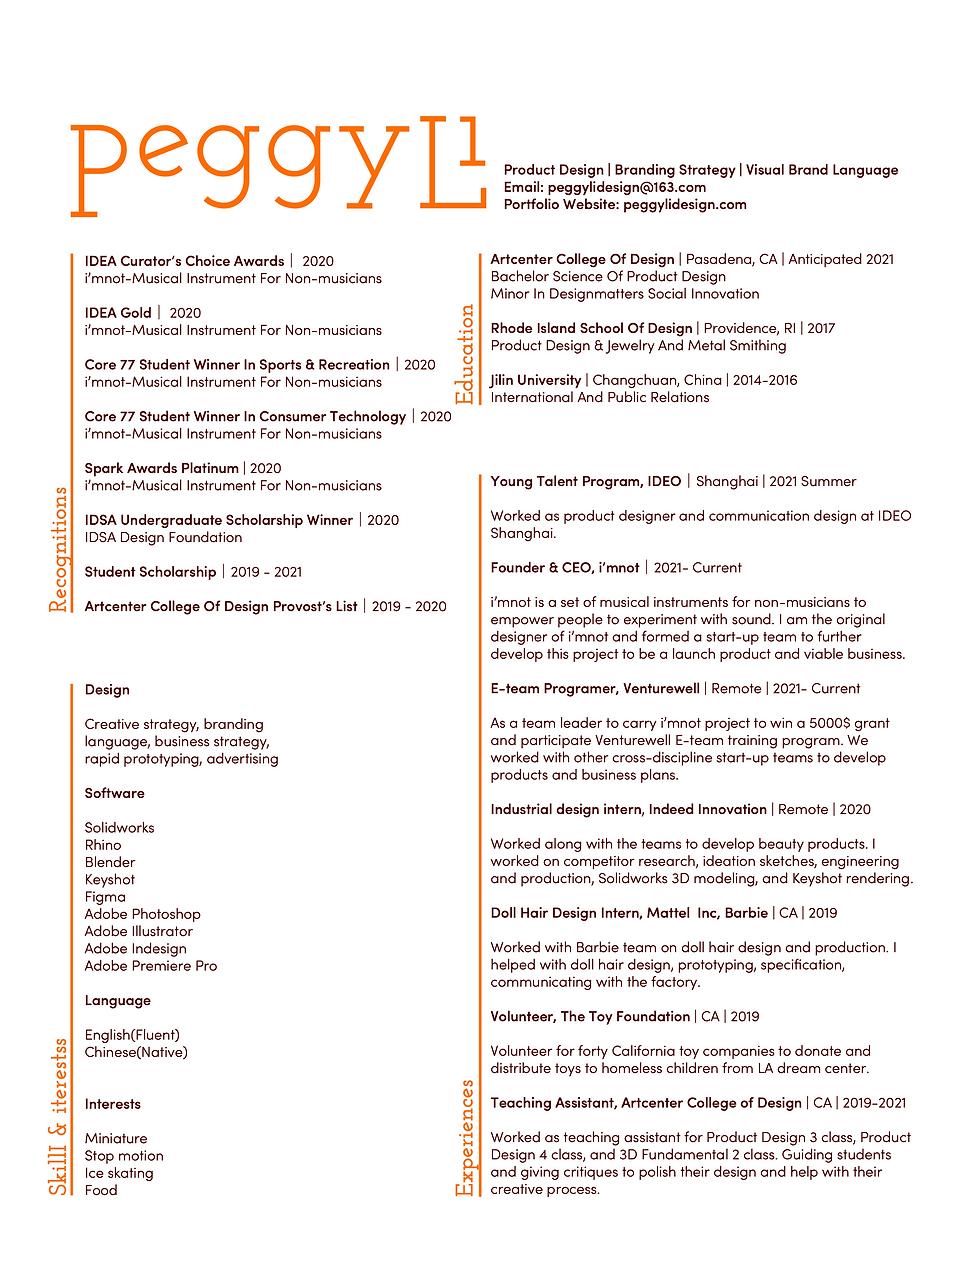 Peggy LI_resume.png